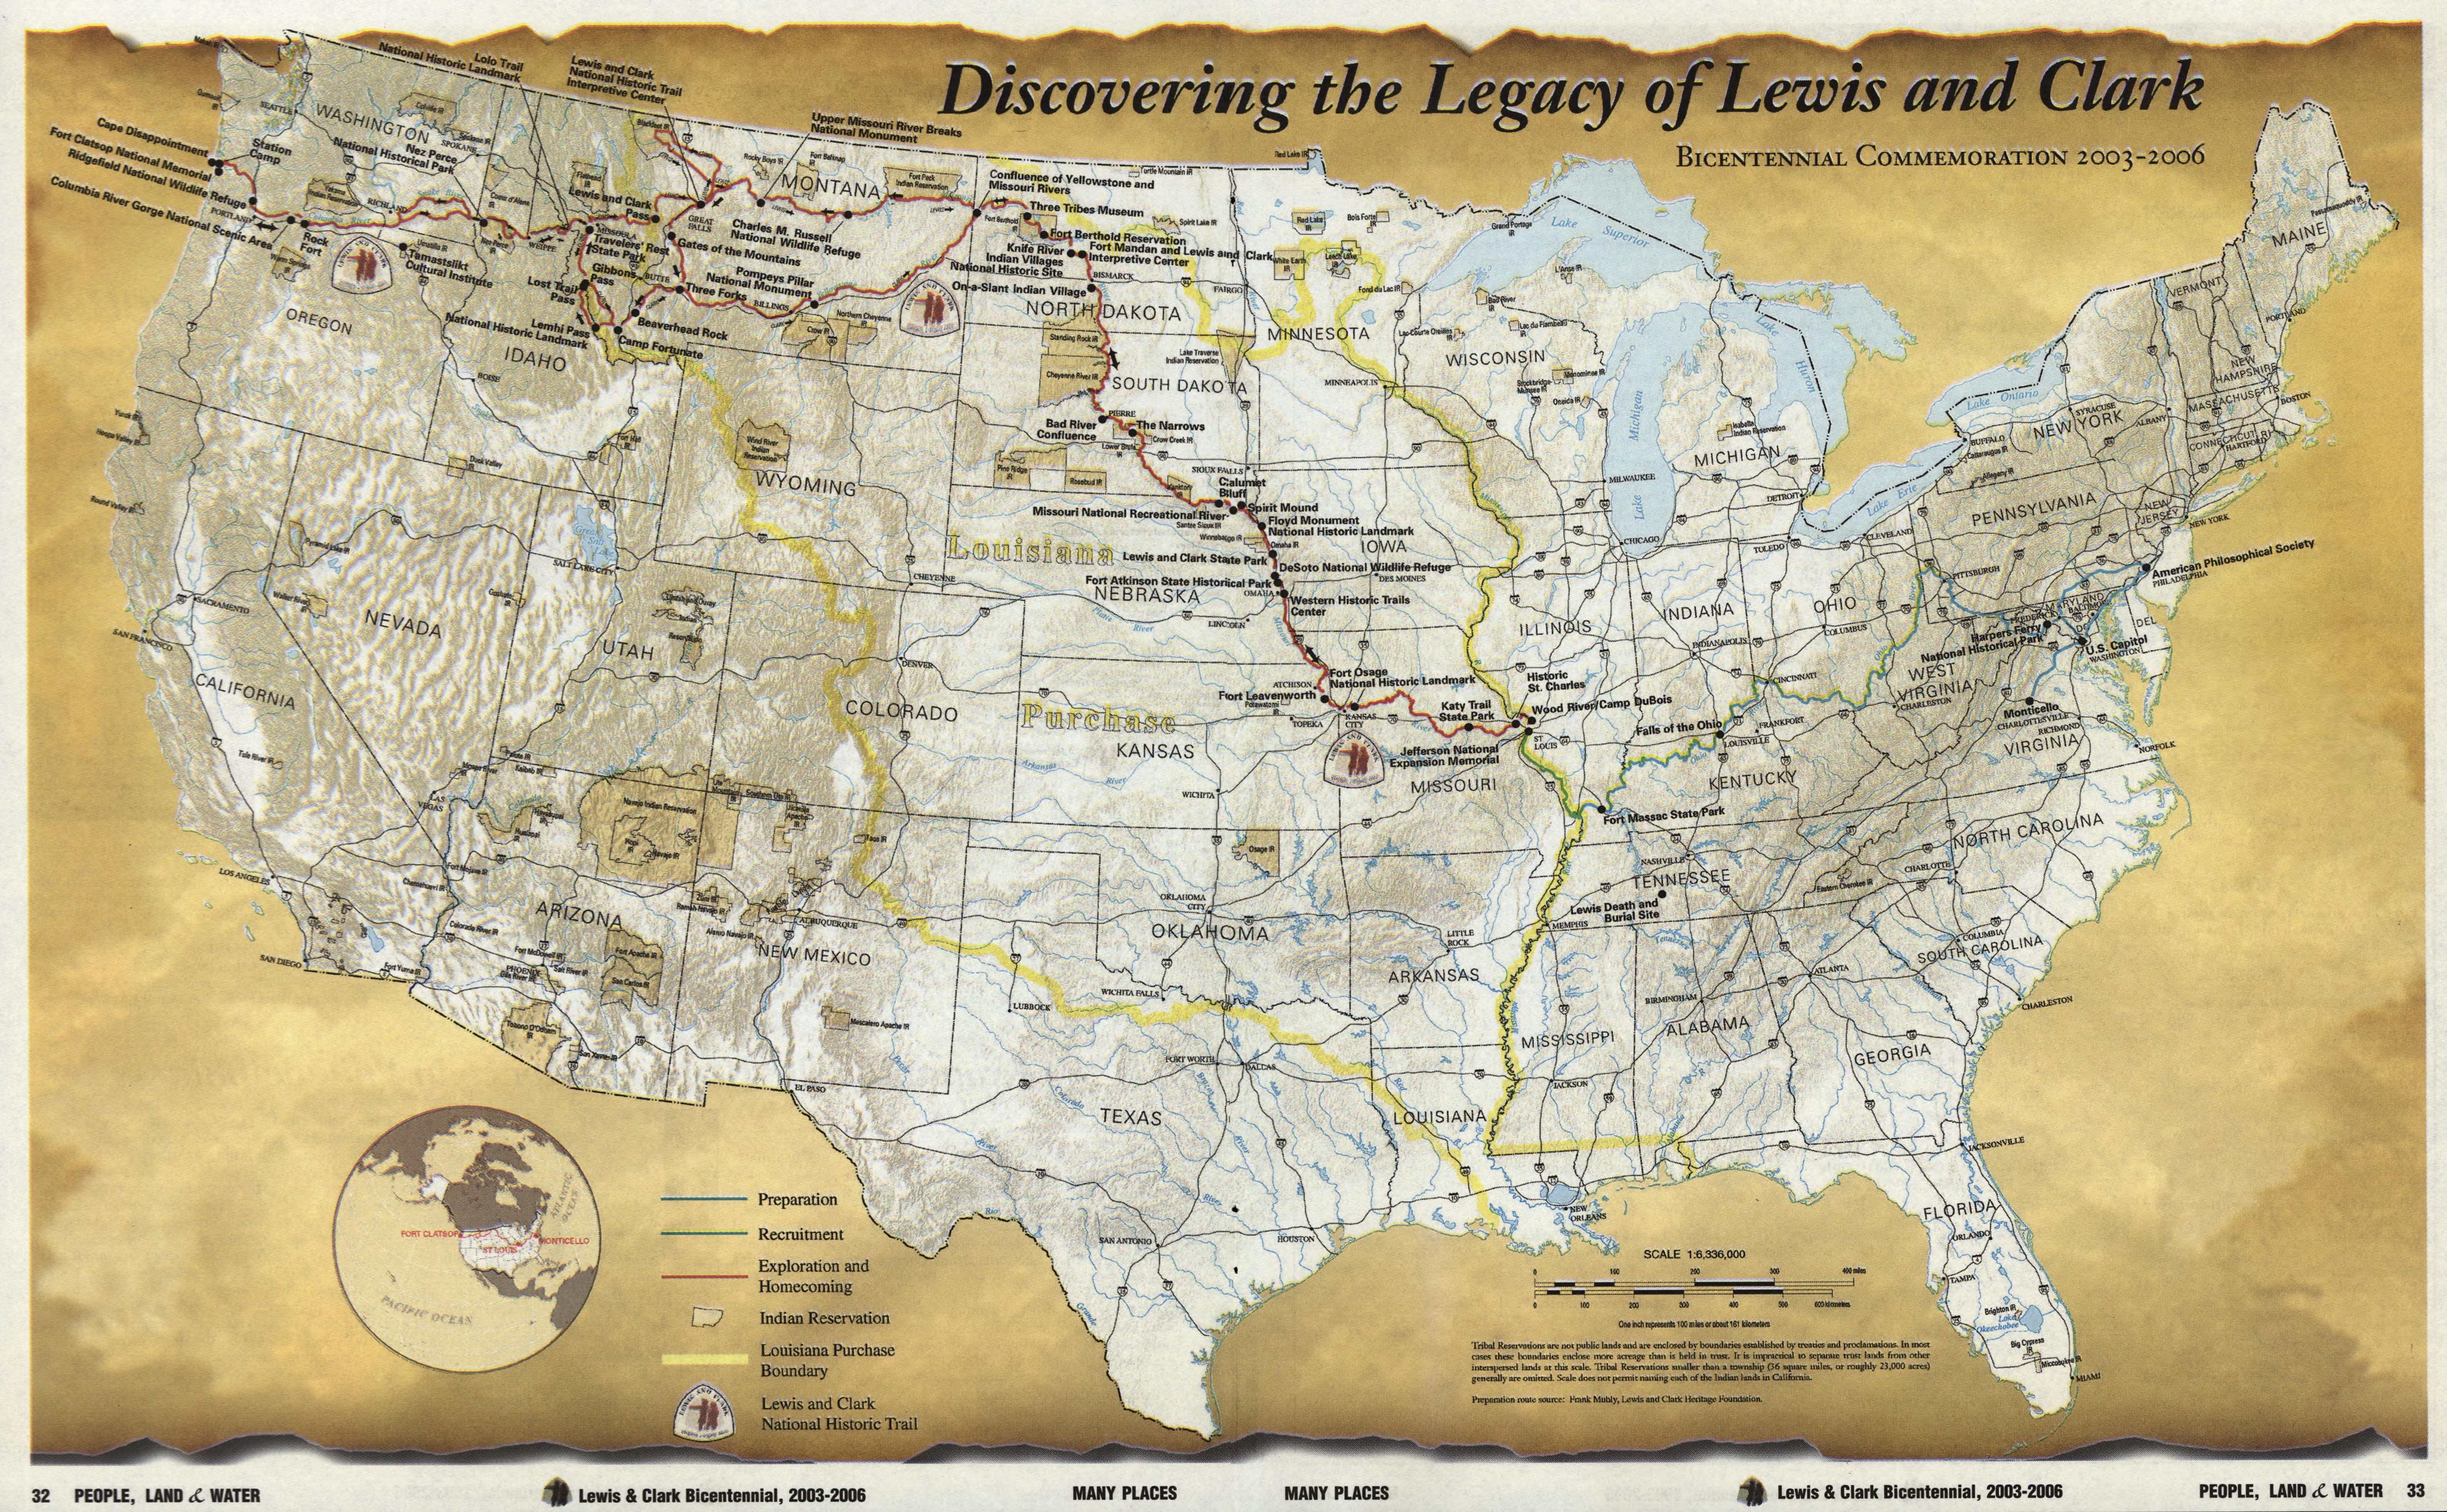 1803 The Louisiana Purchase